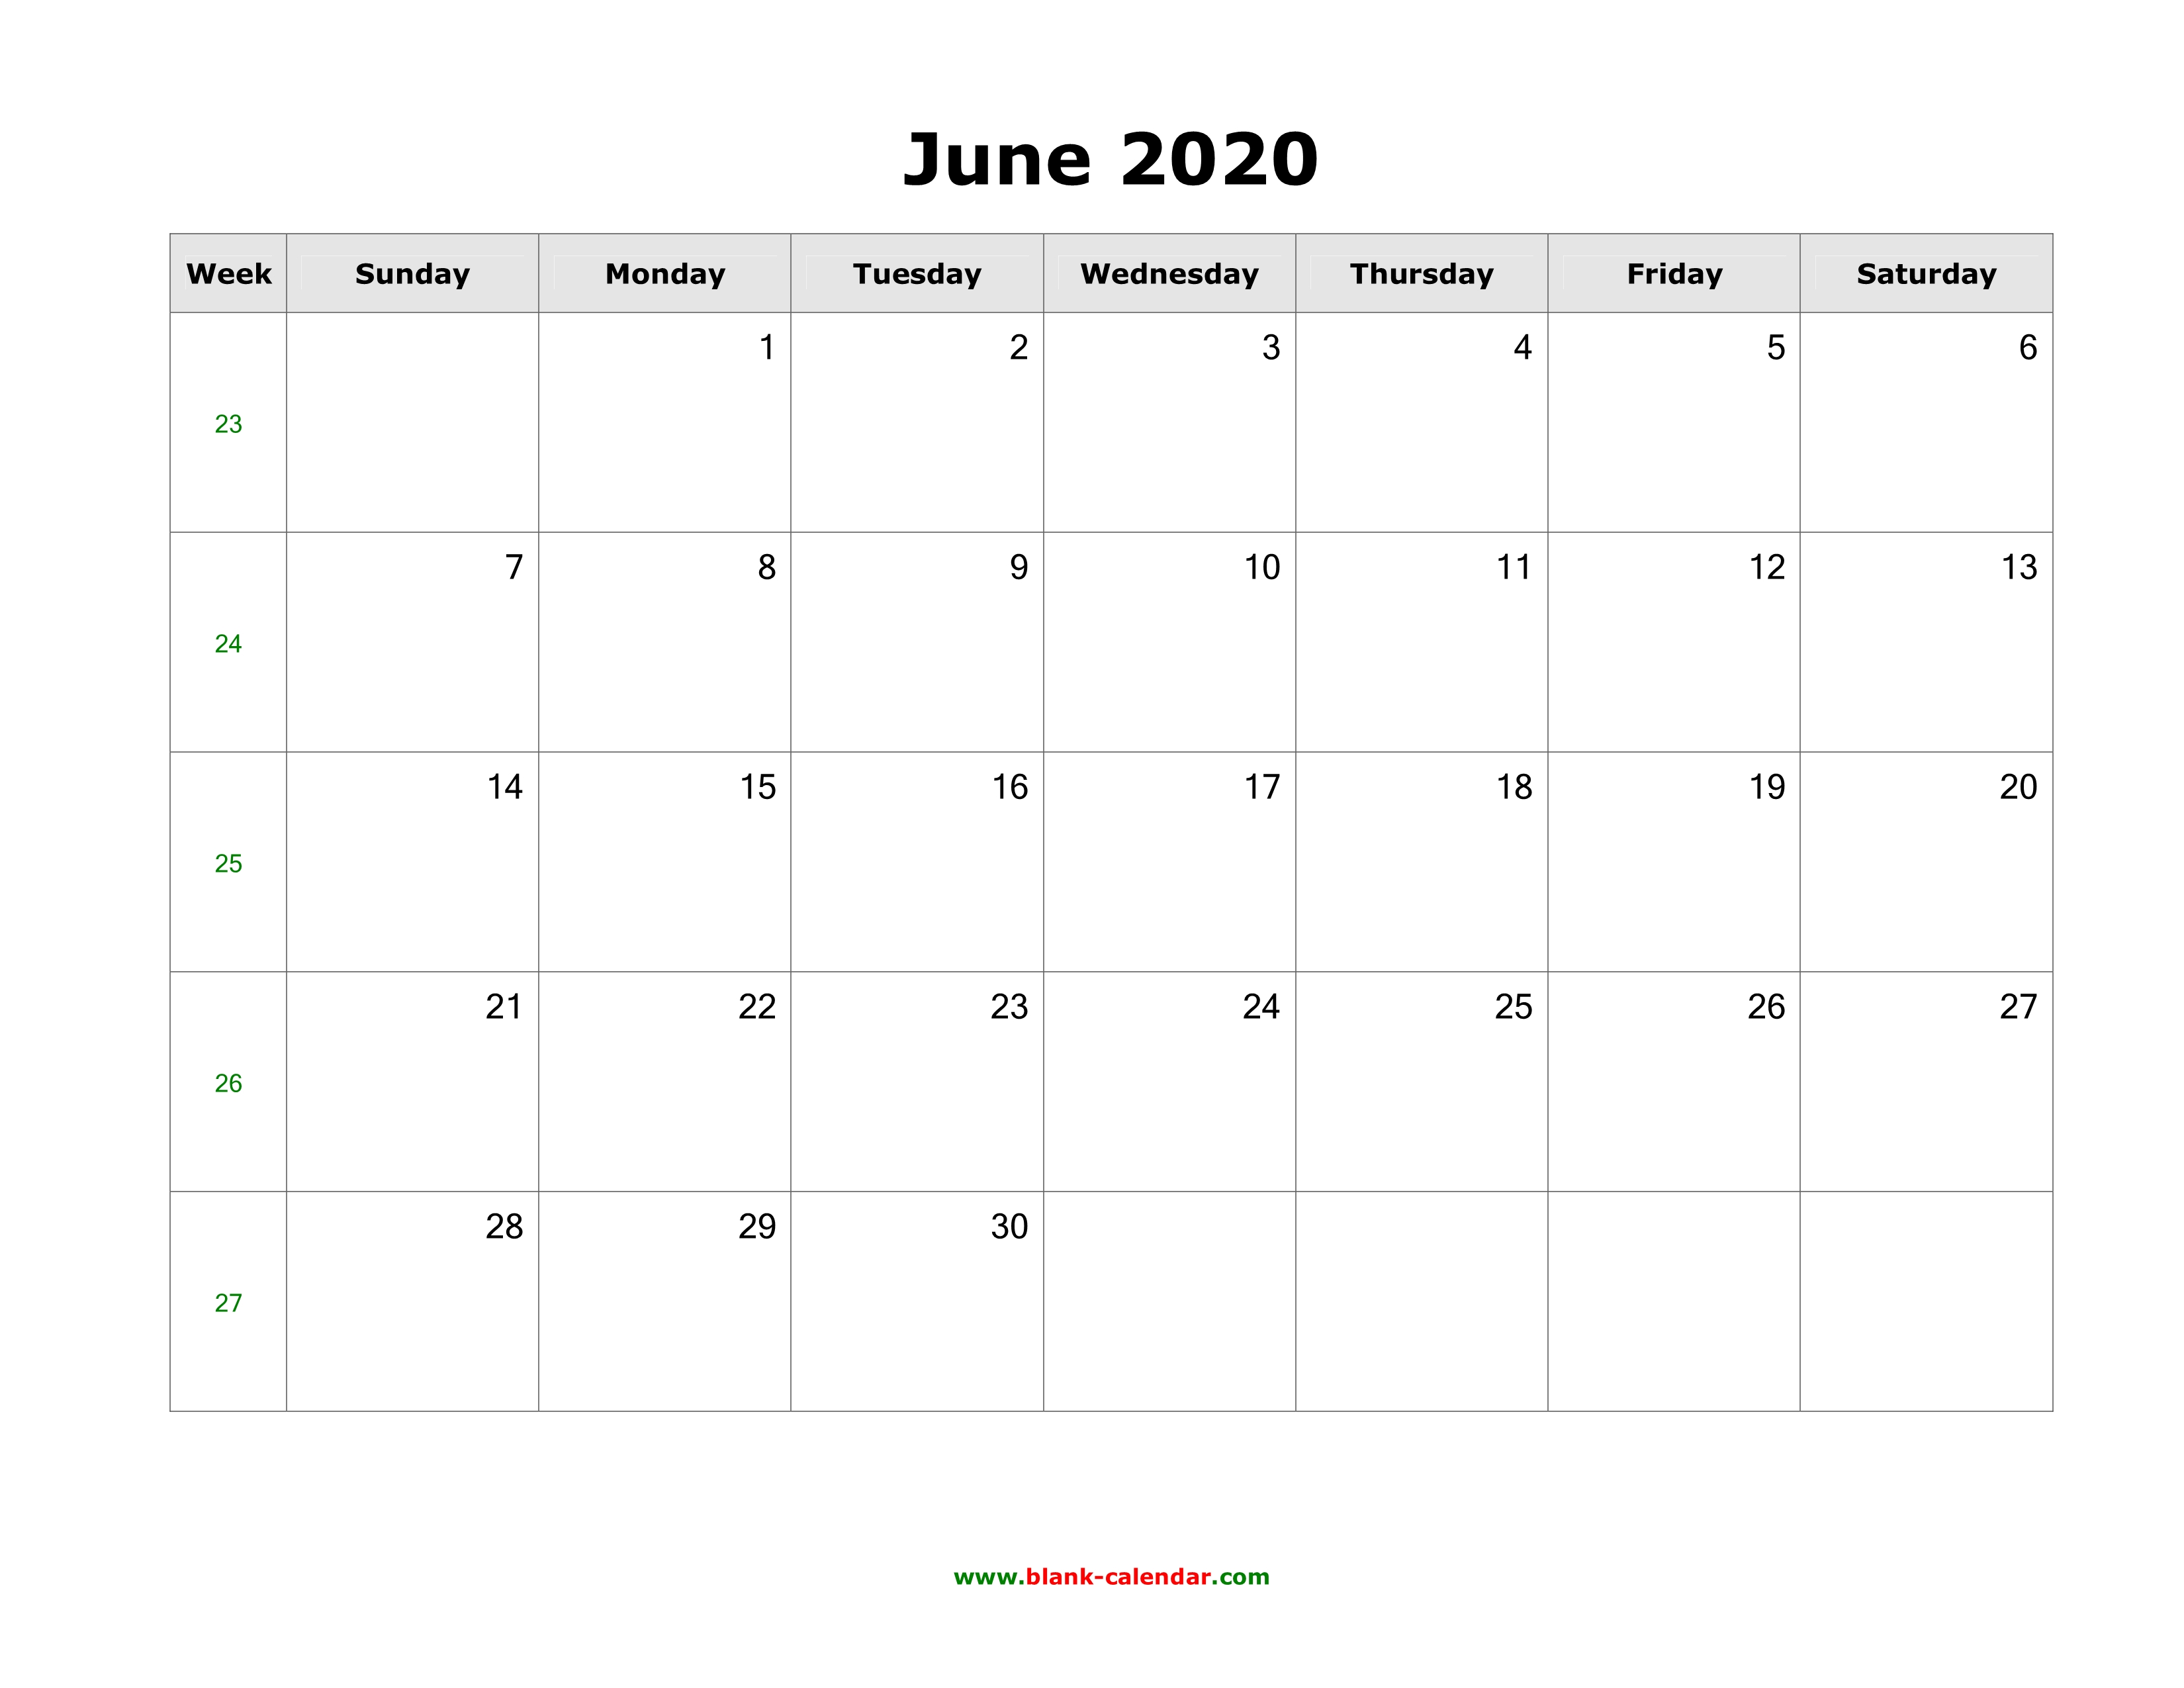 Calendar Of July 2020.Download June 2020 Blank Calendar With Us Holidays Horizontal